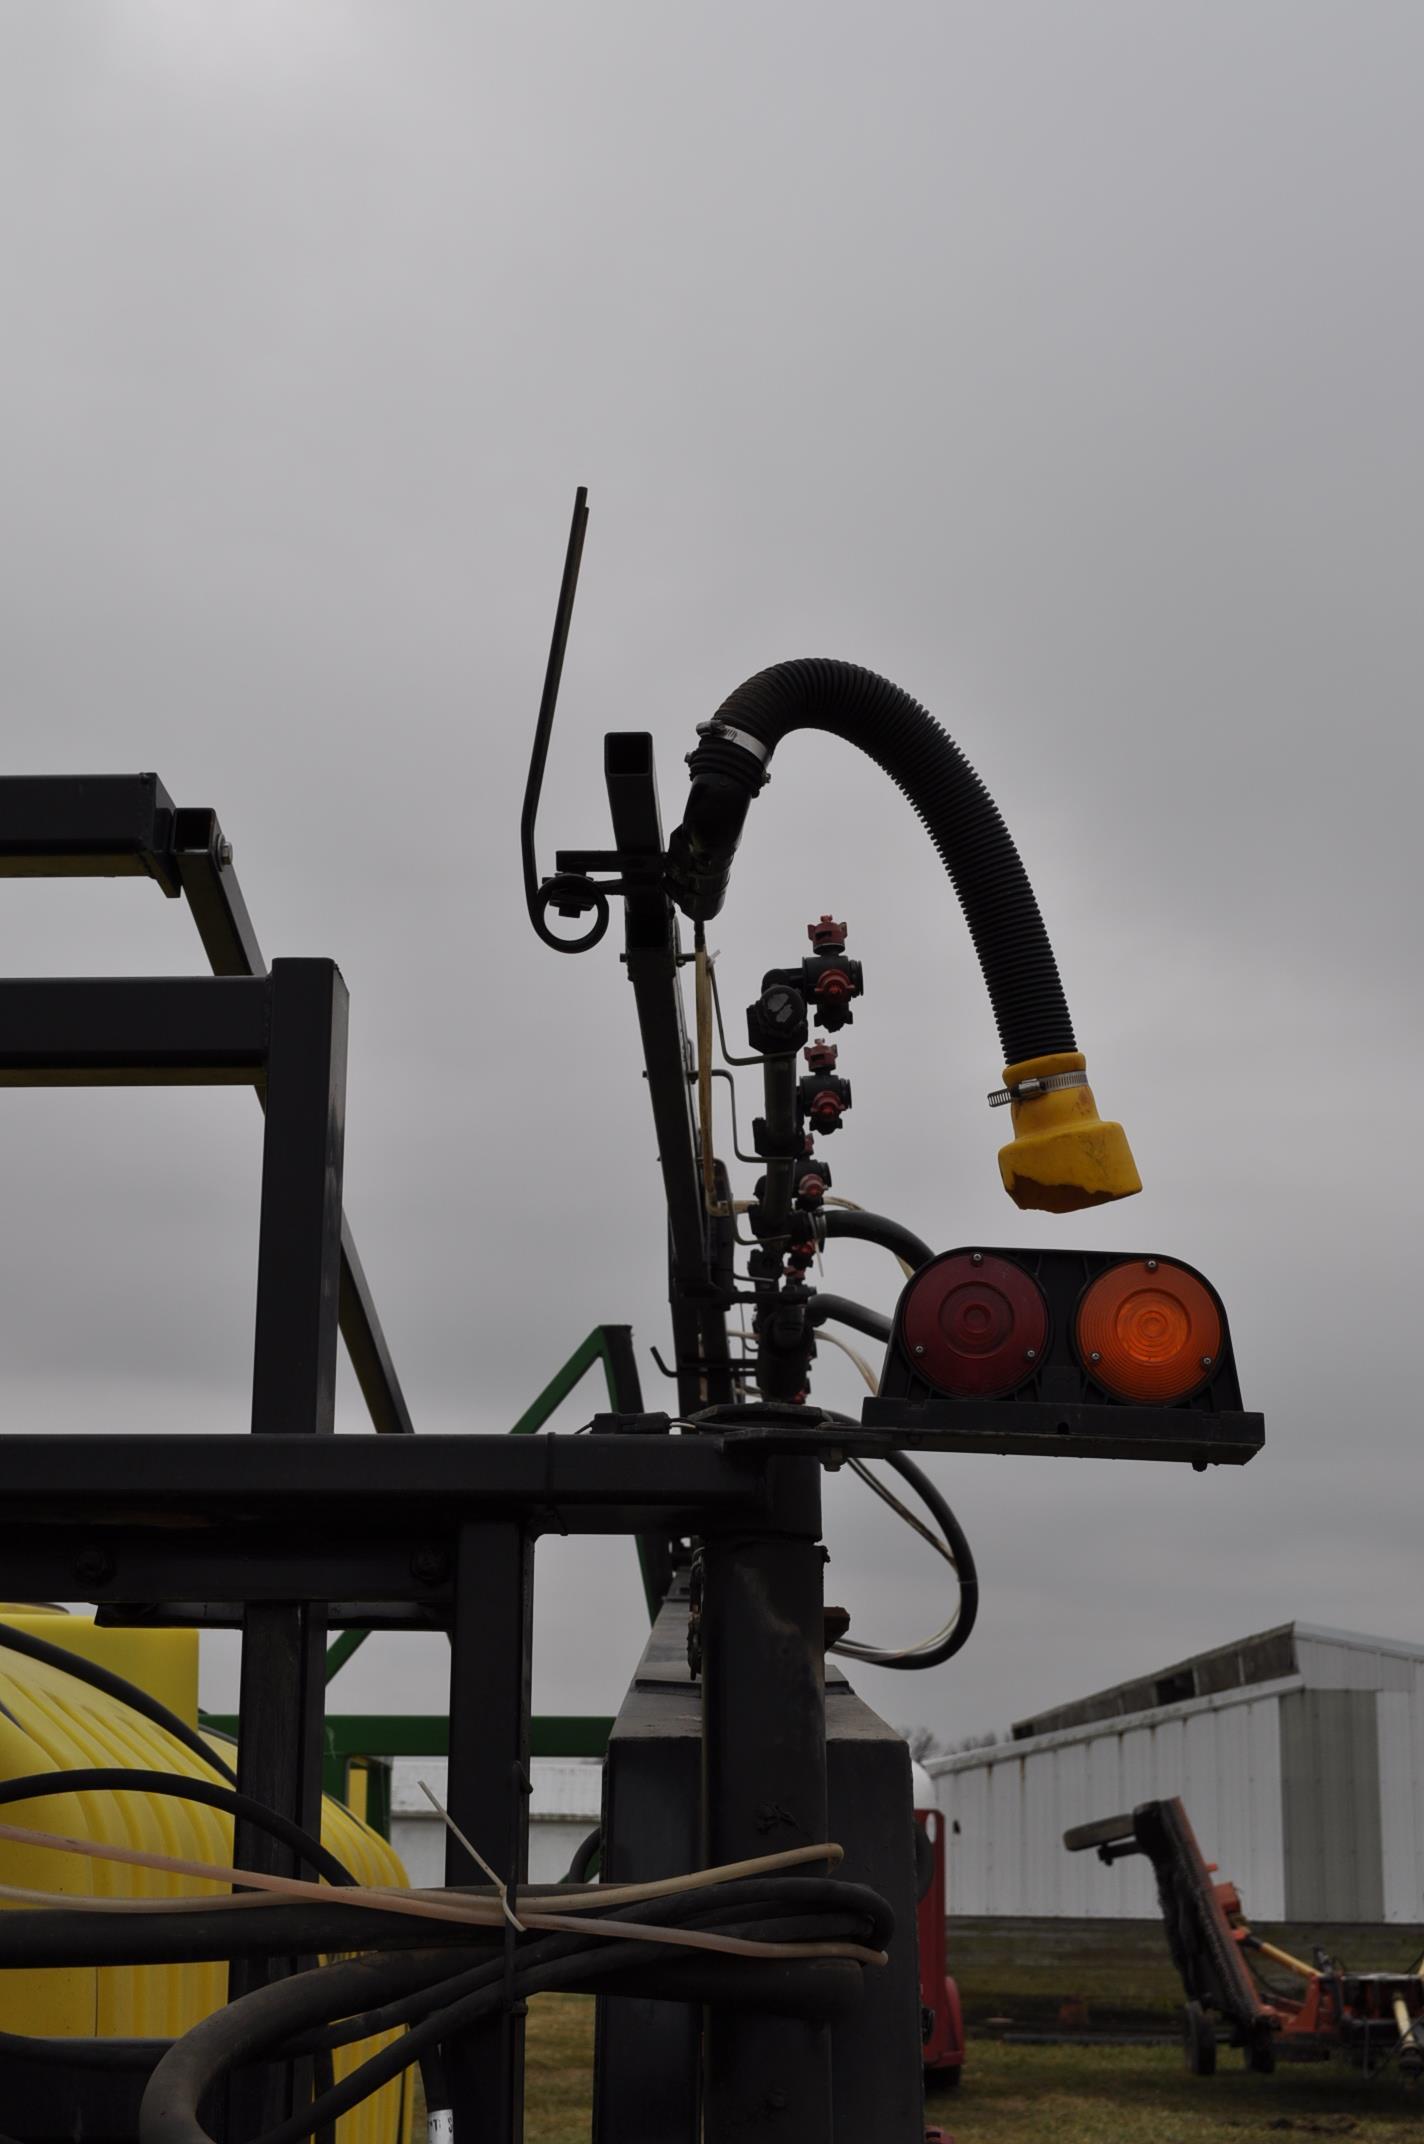 60' Spray King 1090 sprayer, 1000 gal poly tank, 100 gal rinse tank, foam marker, inductor, hyd - Image 18 of 21